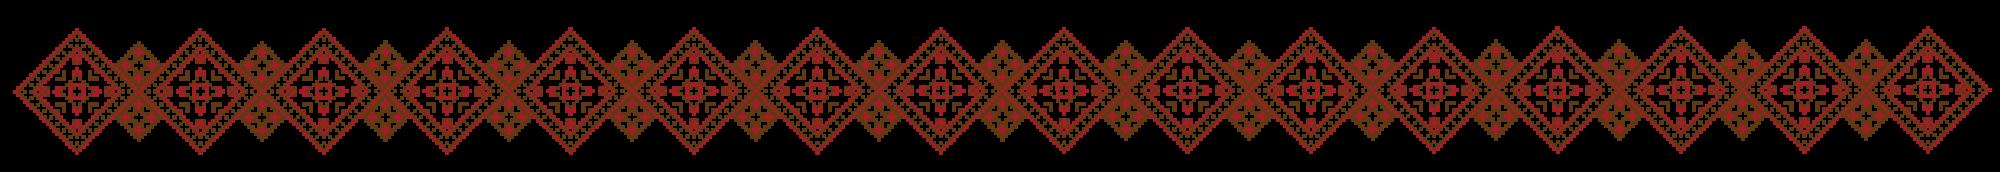 halusky-vzor